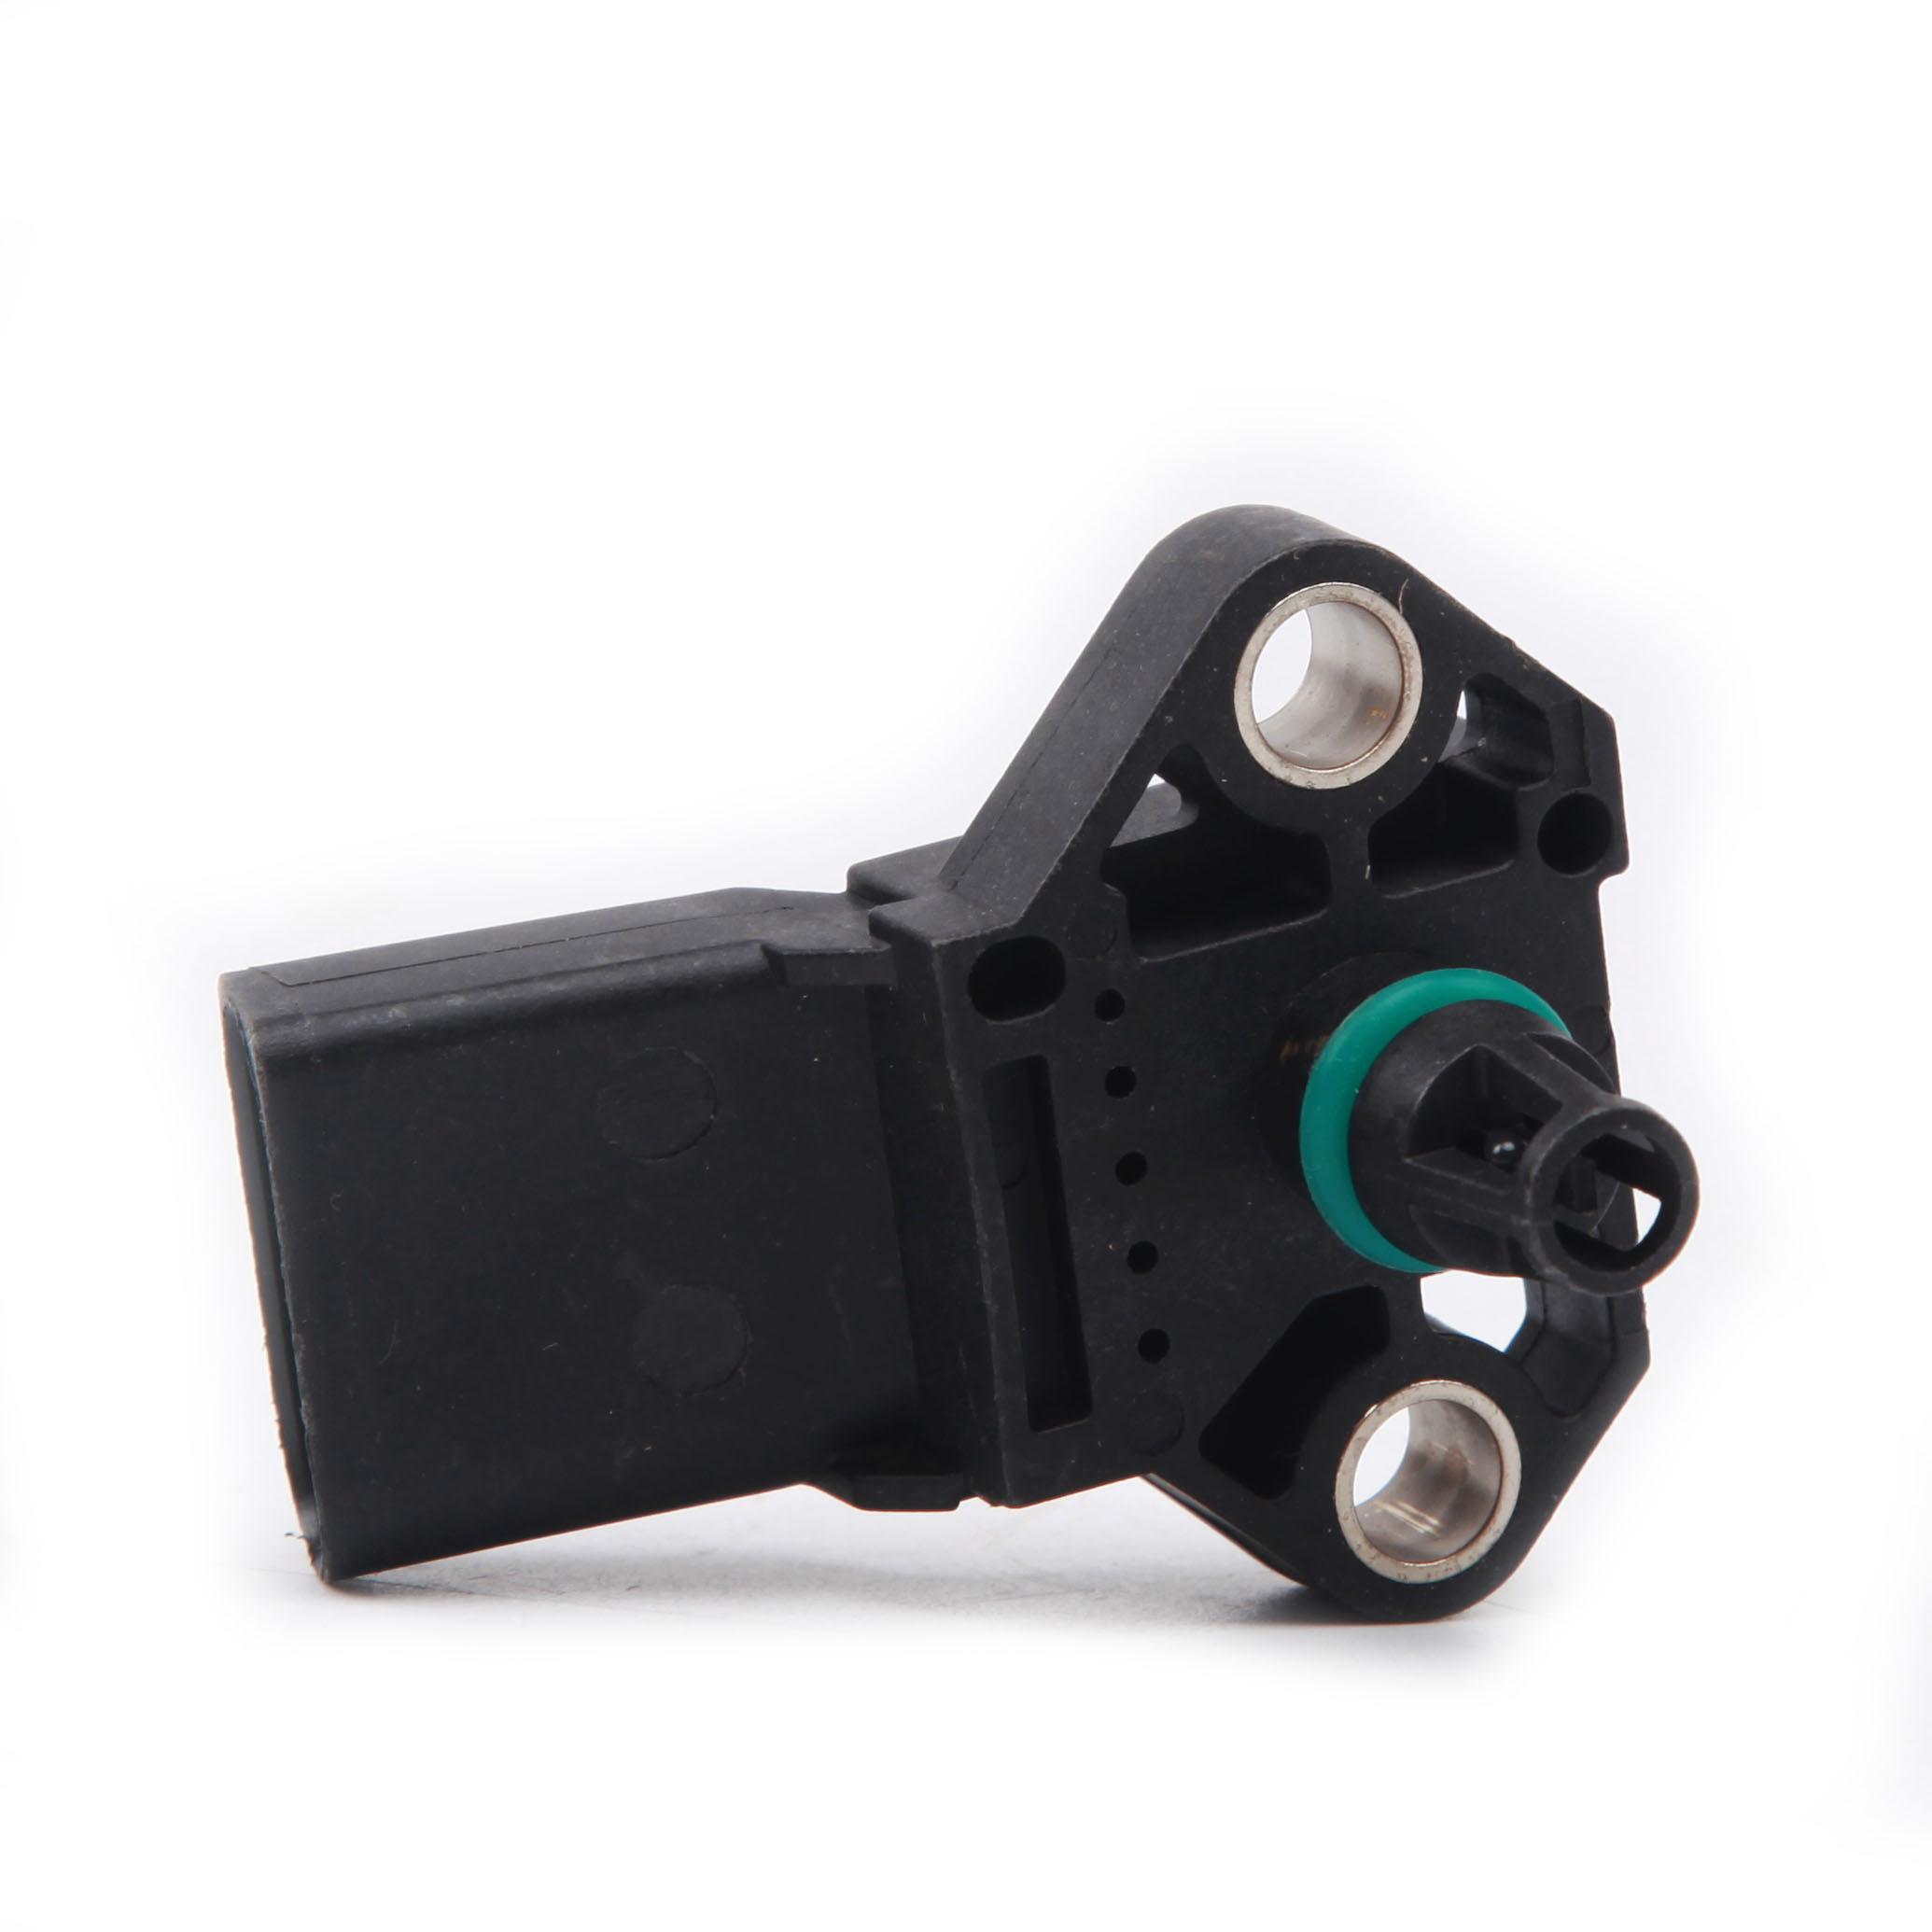 MAP Pressure Sensor 038906051D Replacement For VW Passat S3 TT 1999-14 1.8 2.0T 038 906 051 D